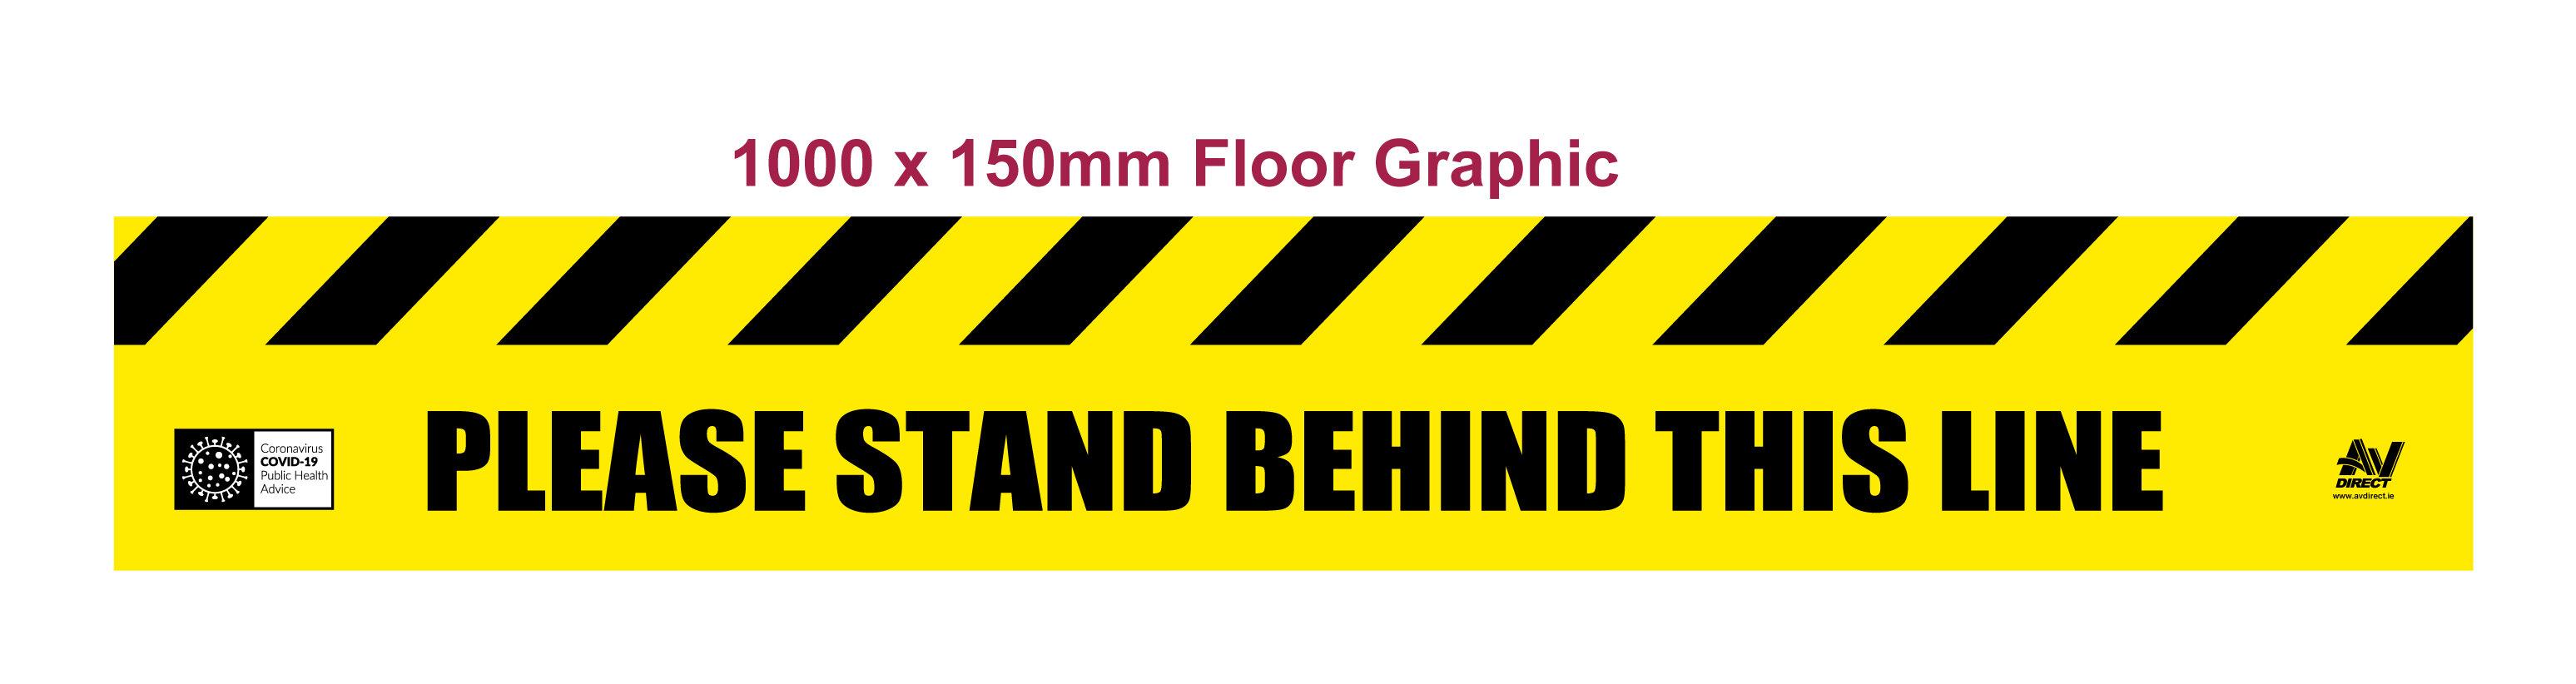 Floor Graphic with Hazard Strip